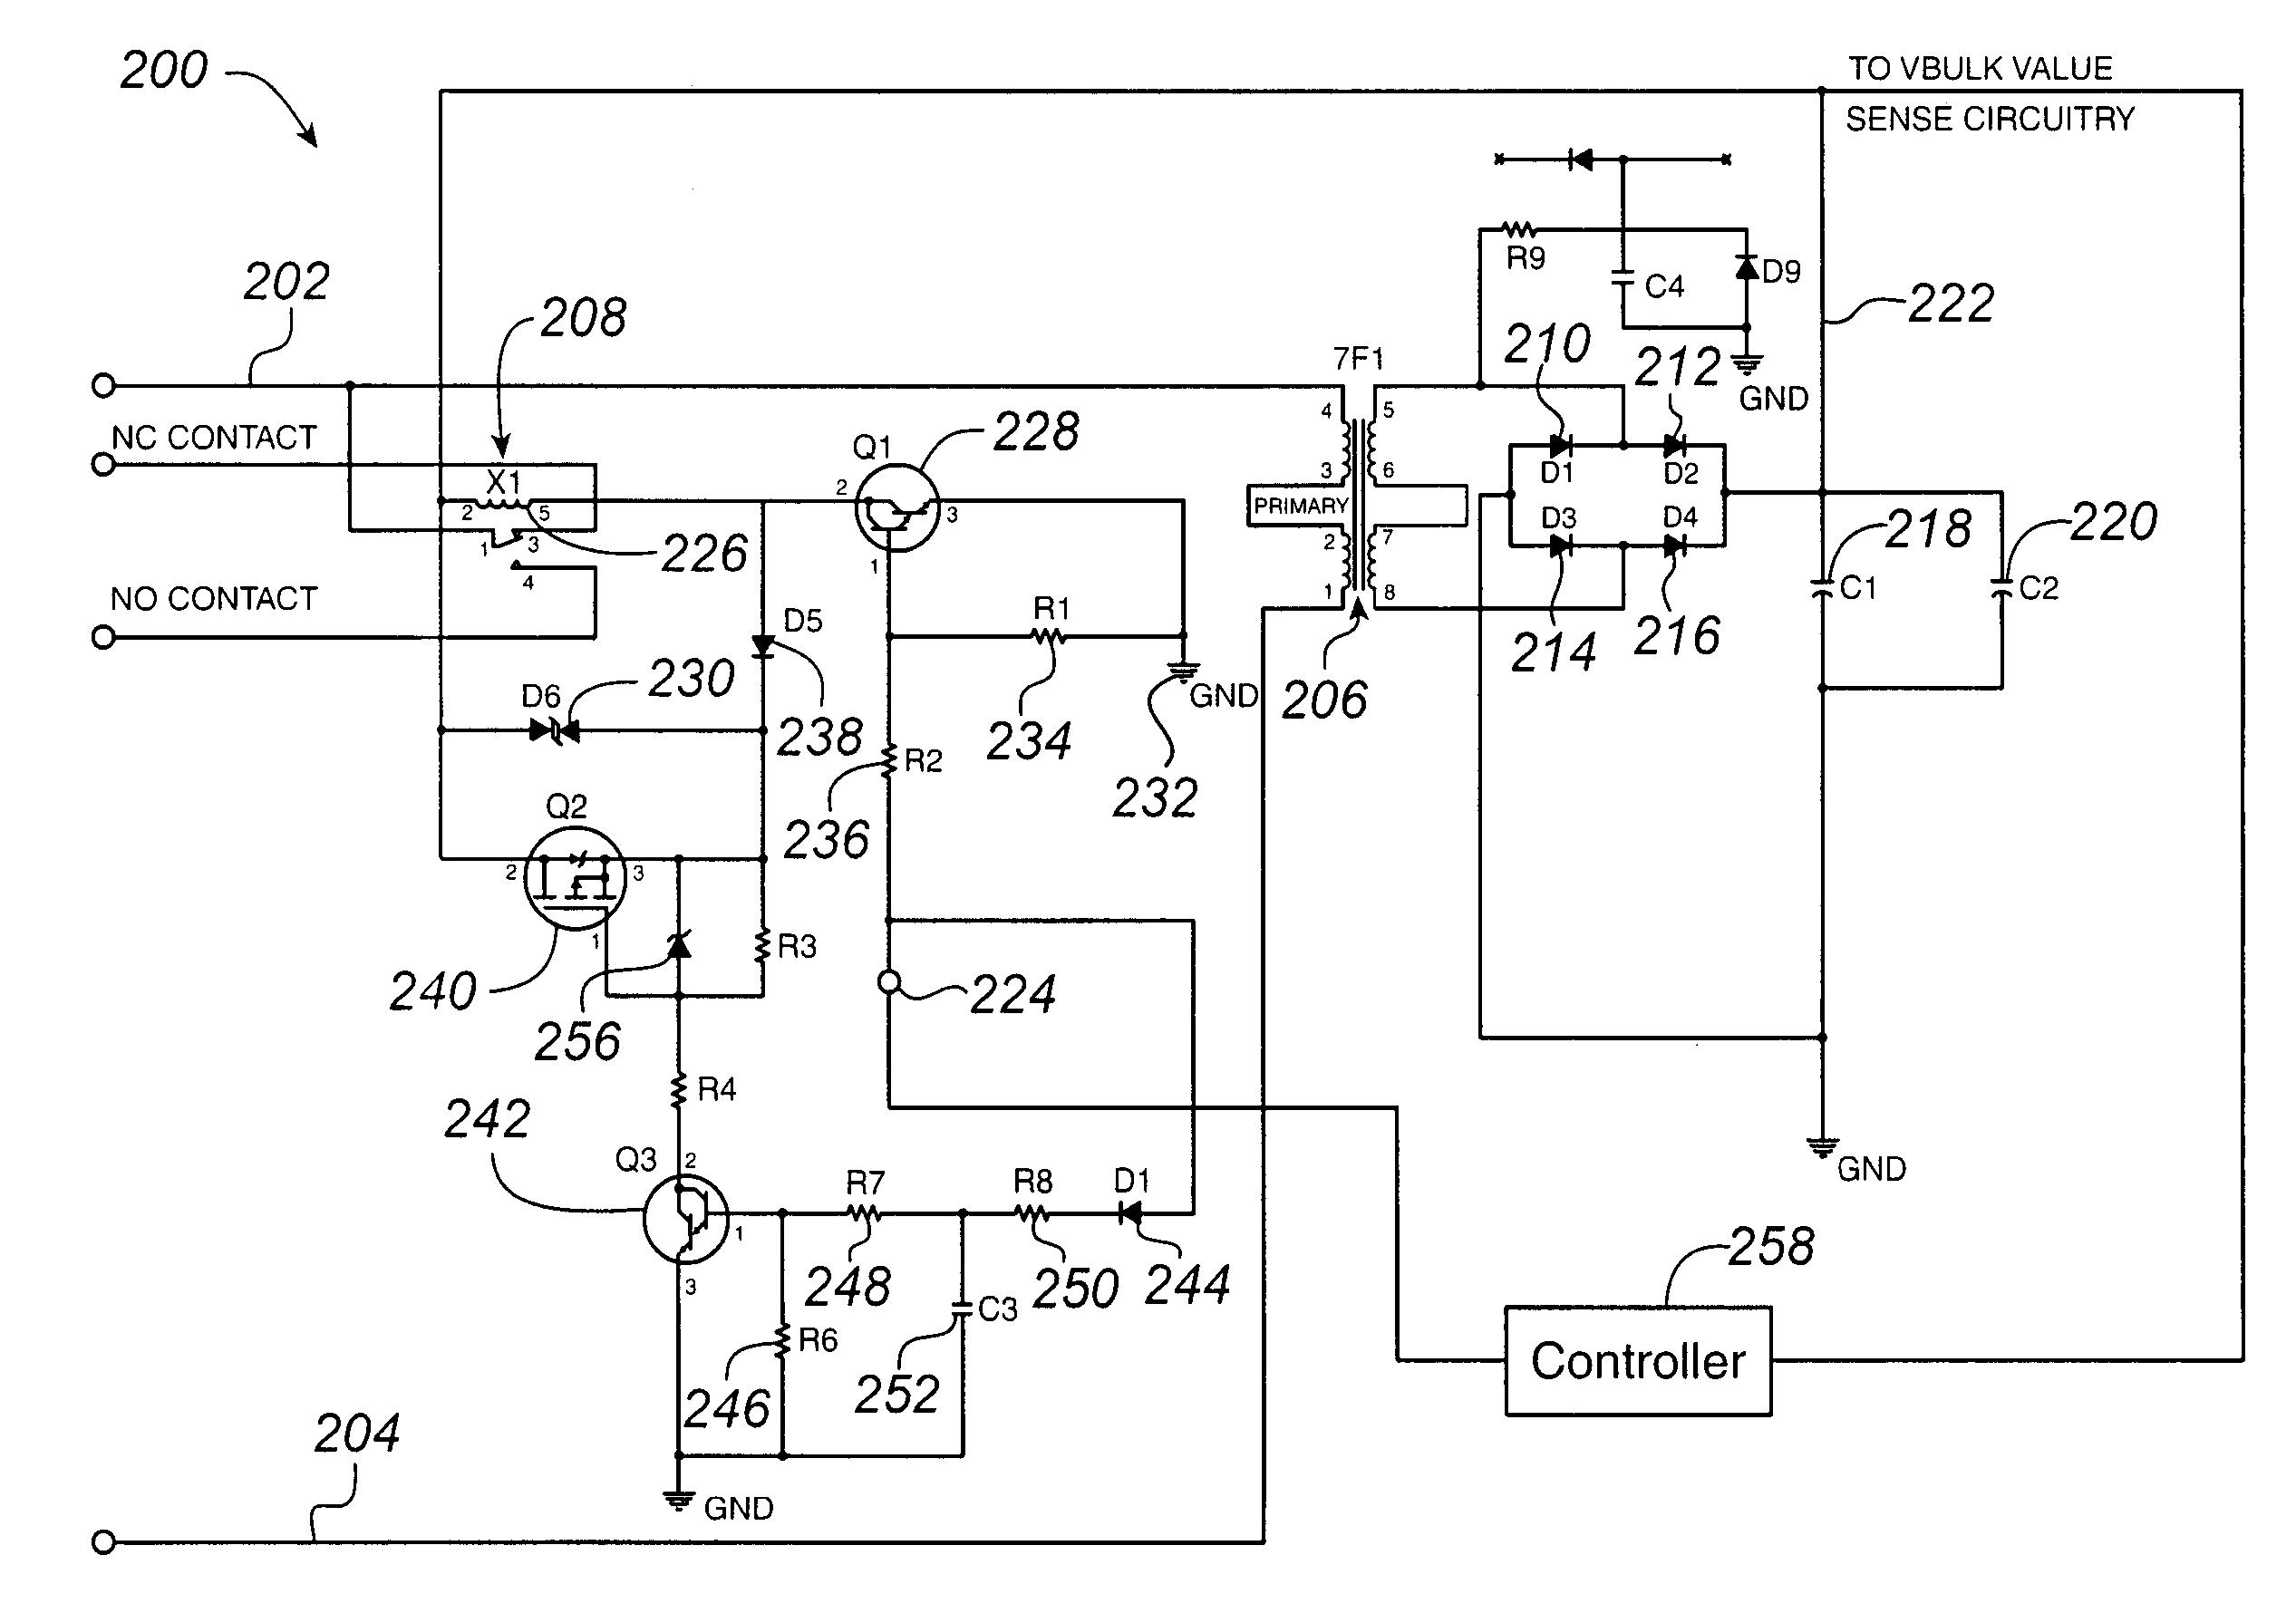 Champion Wiring Diagram Experts Of 62 Ford Generator Evaporative Cooler Trusted Diagrams Rh Chicagoitalianrestaurants Com Bus